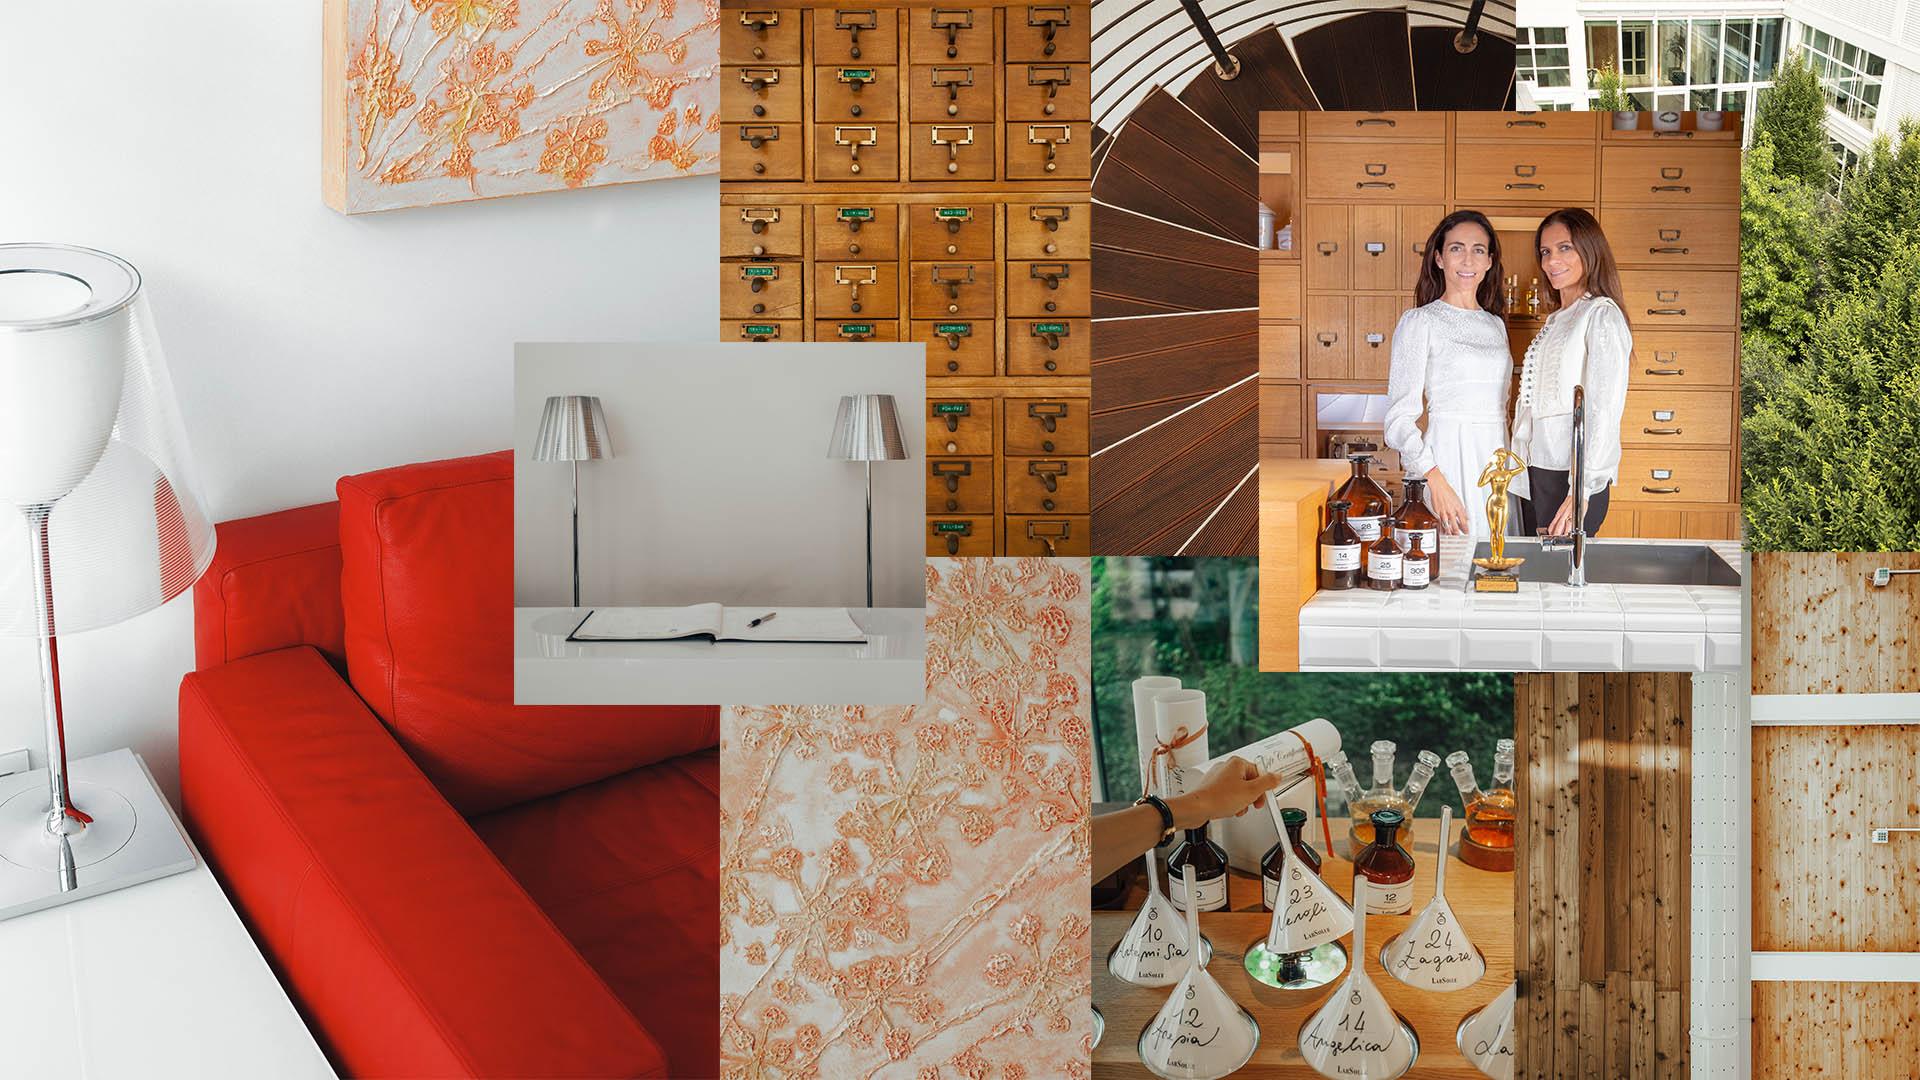 Independent Minds: Martone Family, Magna Pars L'Hotel à Parfum